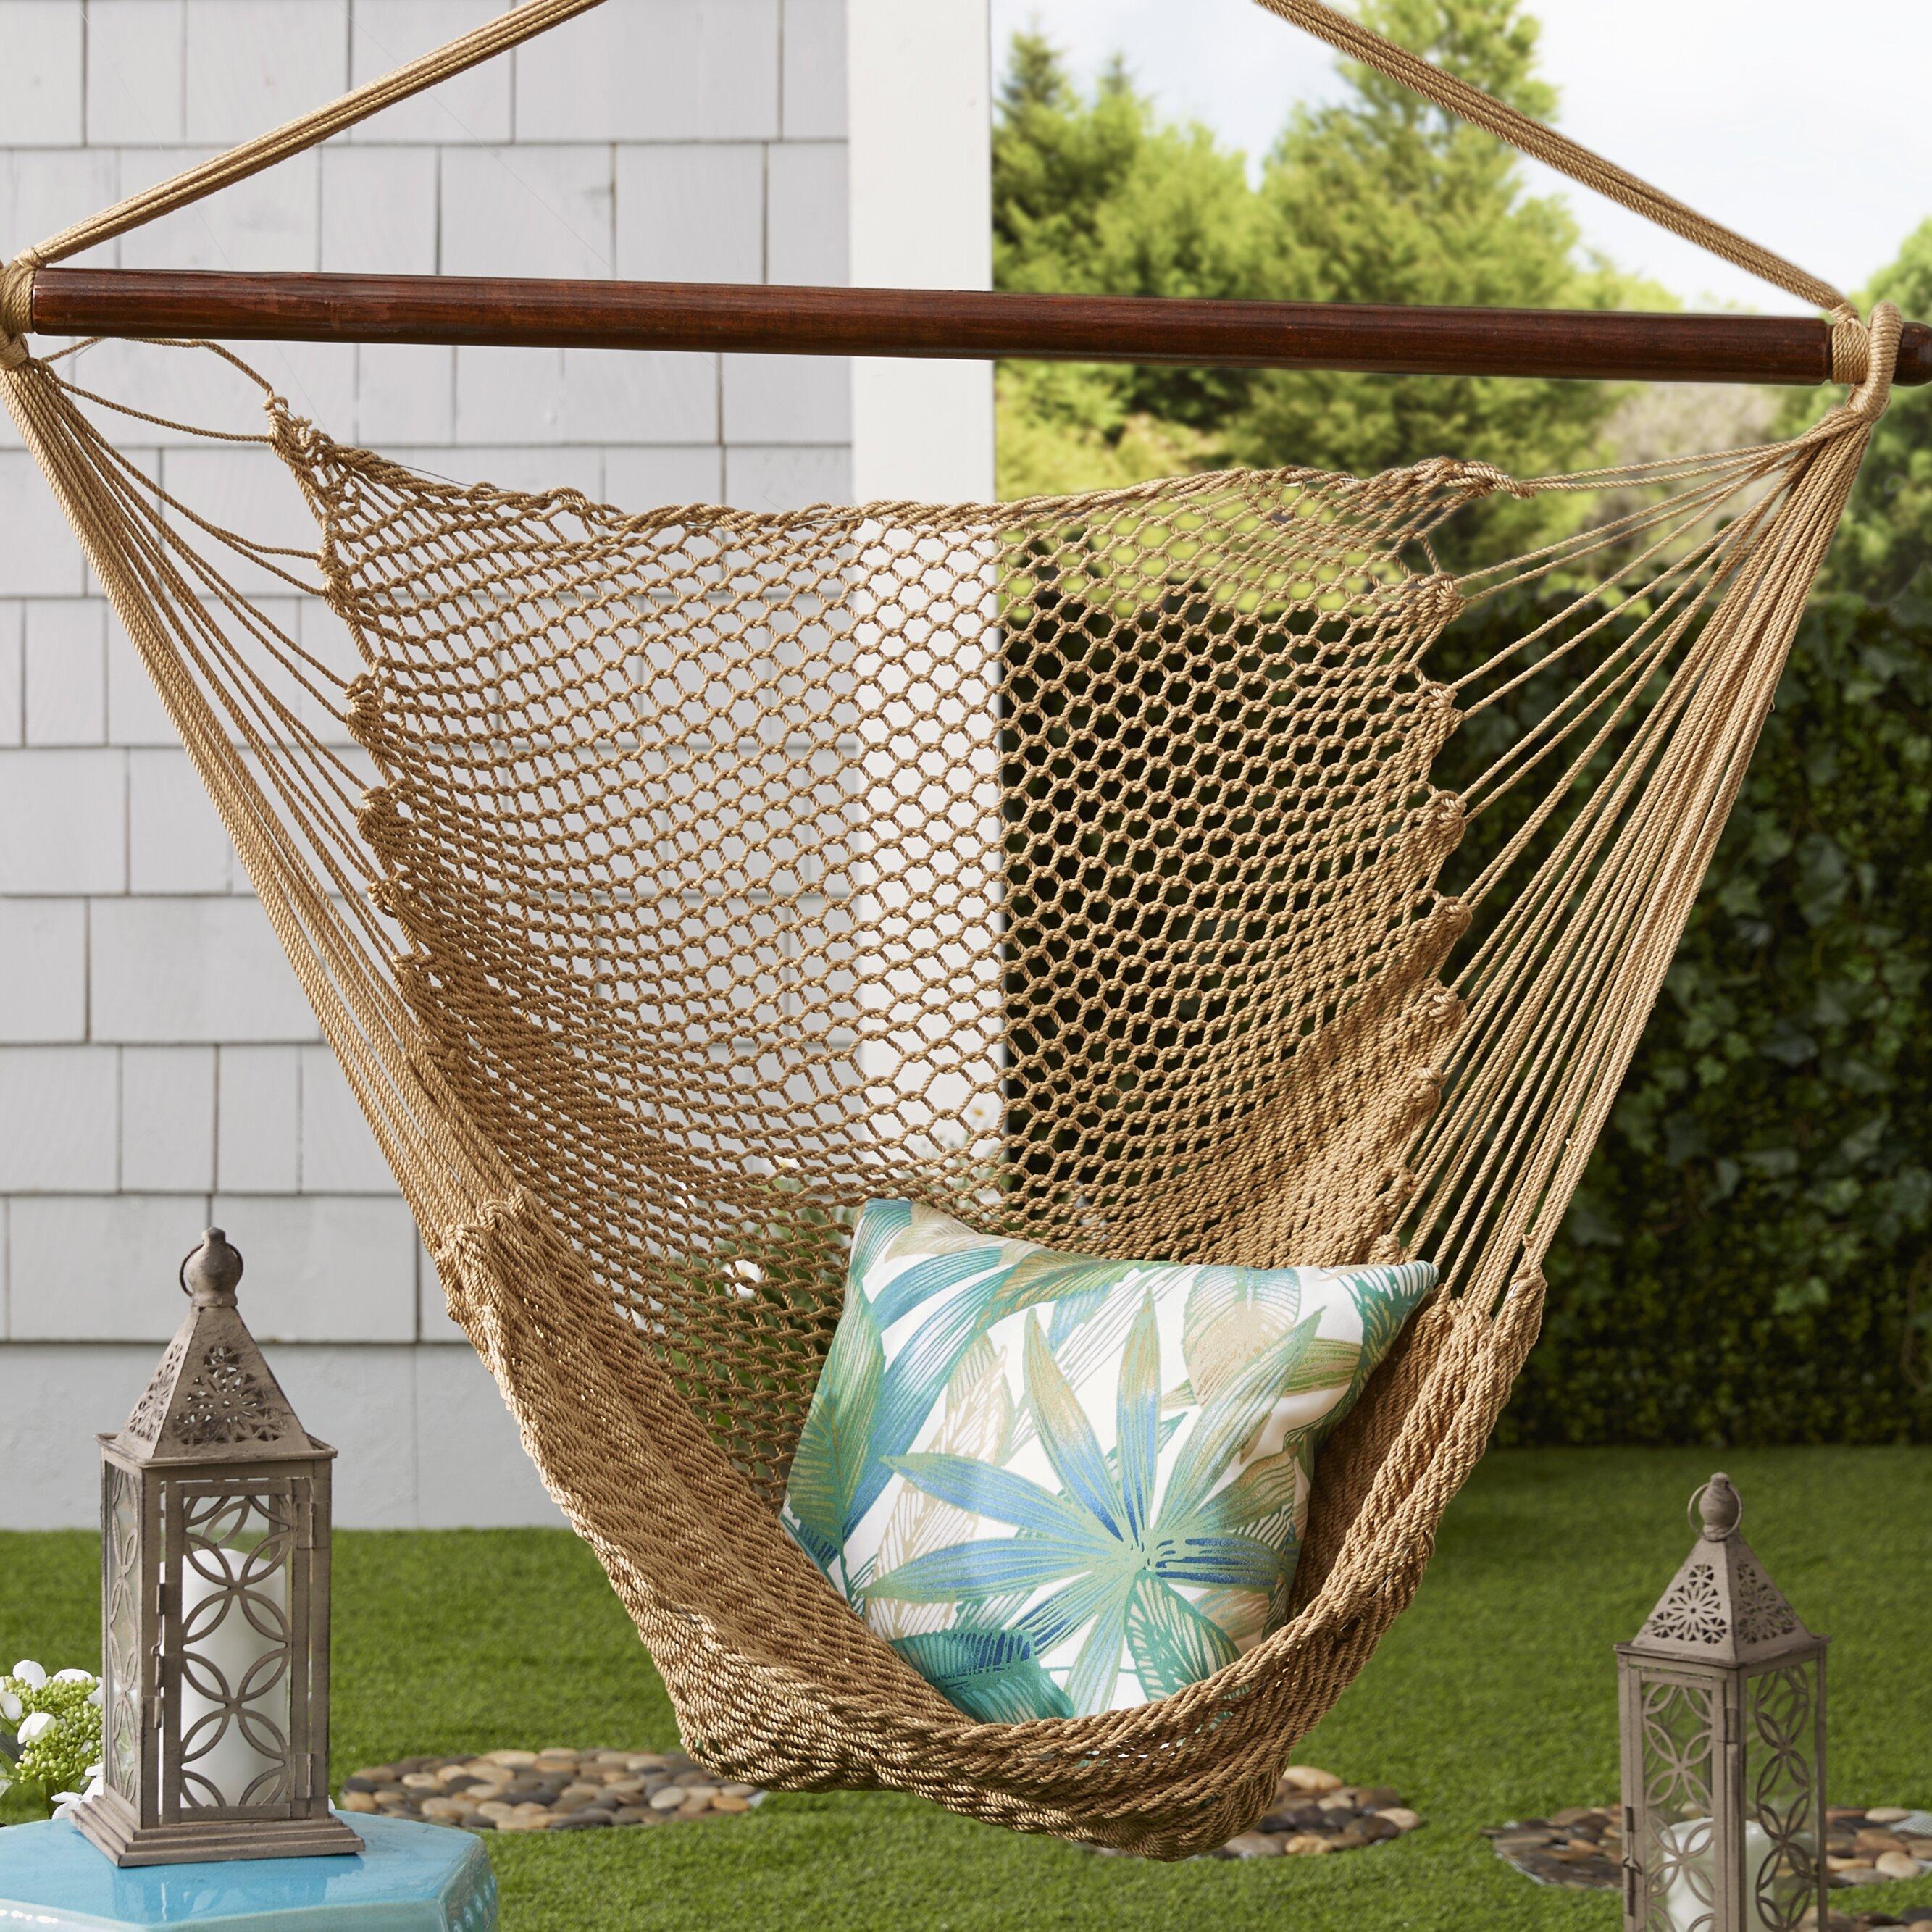 Algoma Net Company – Algoma Butterfly Chair